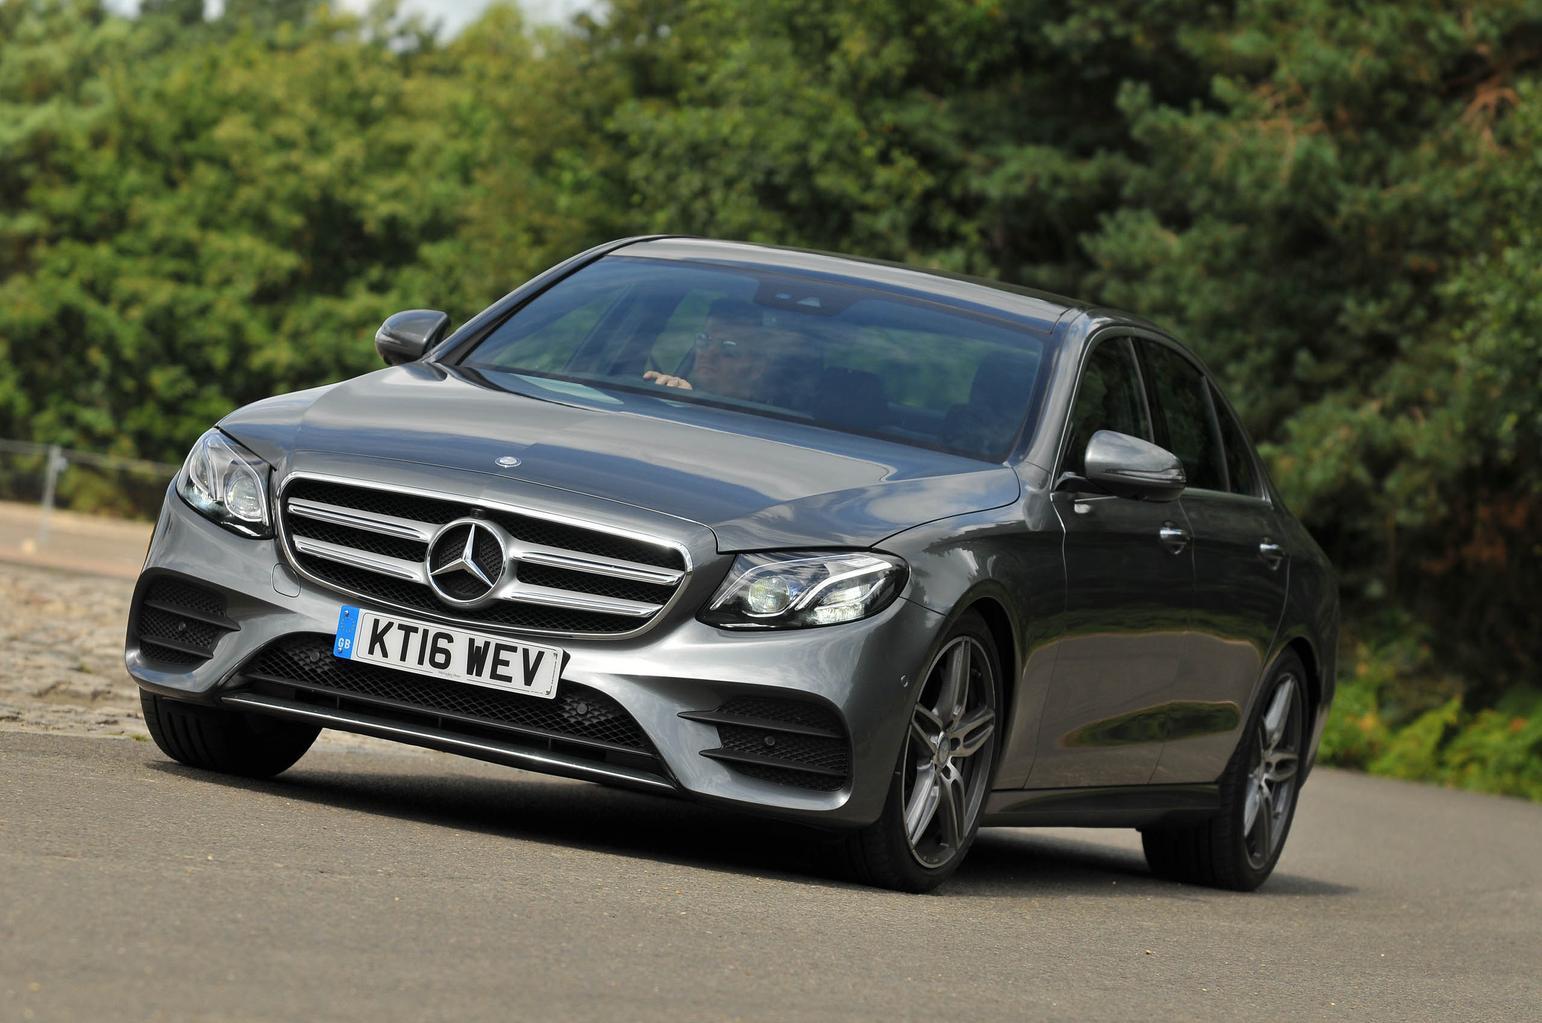 2016 Mercedes-Benz E-Class E 350 d review